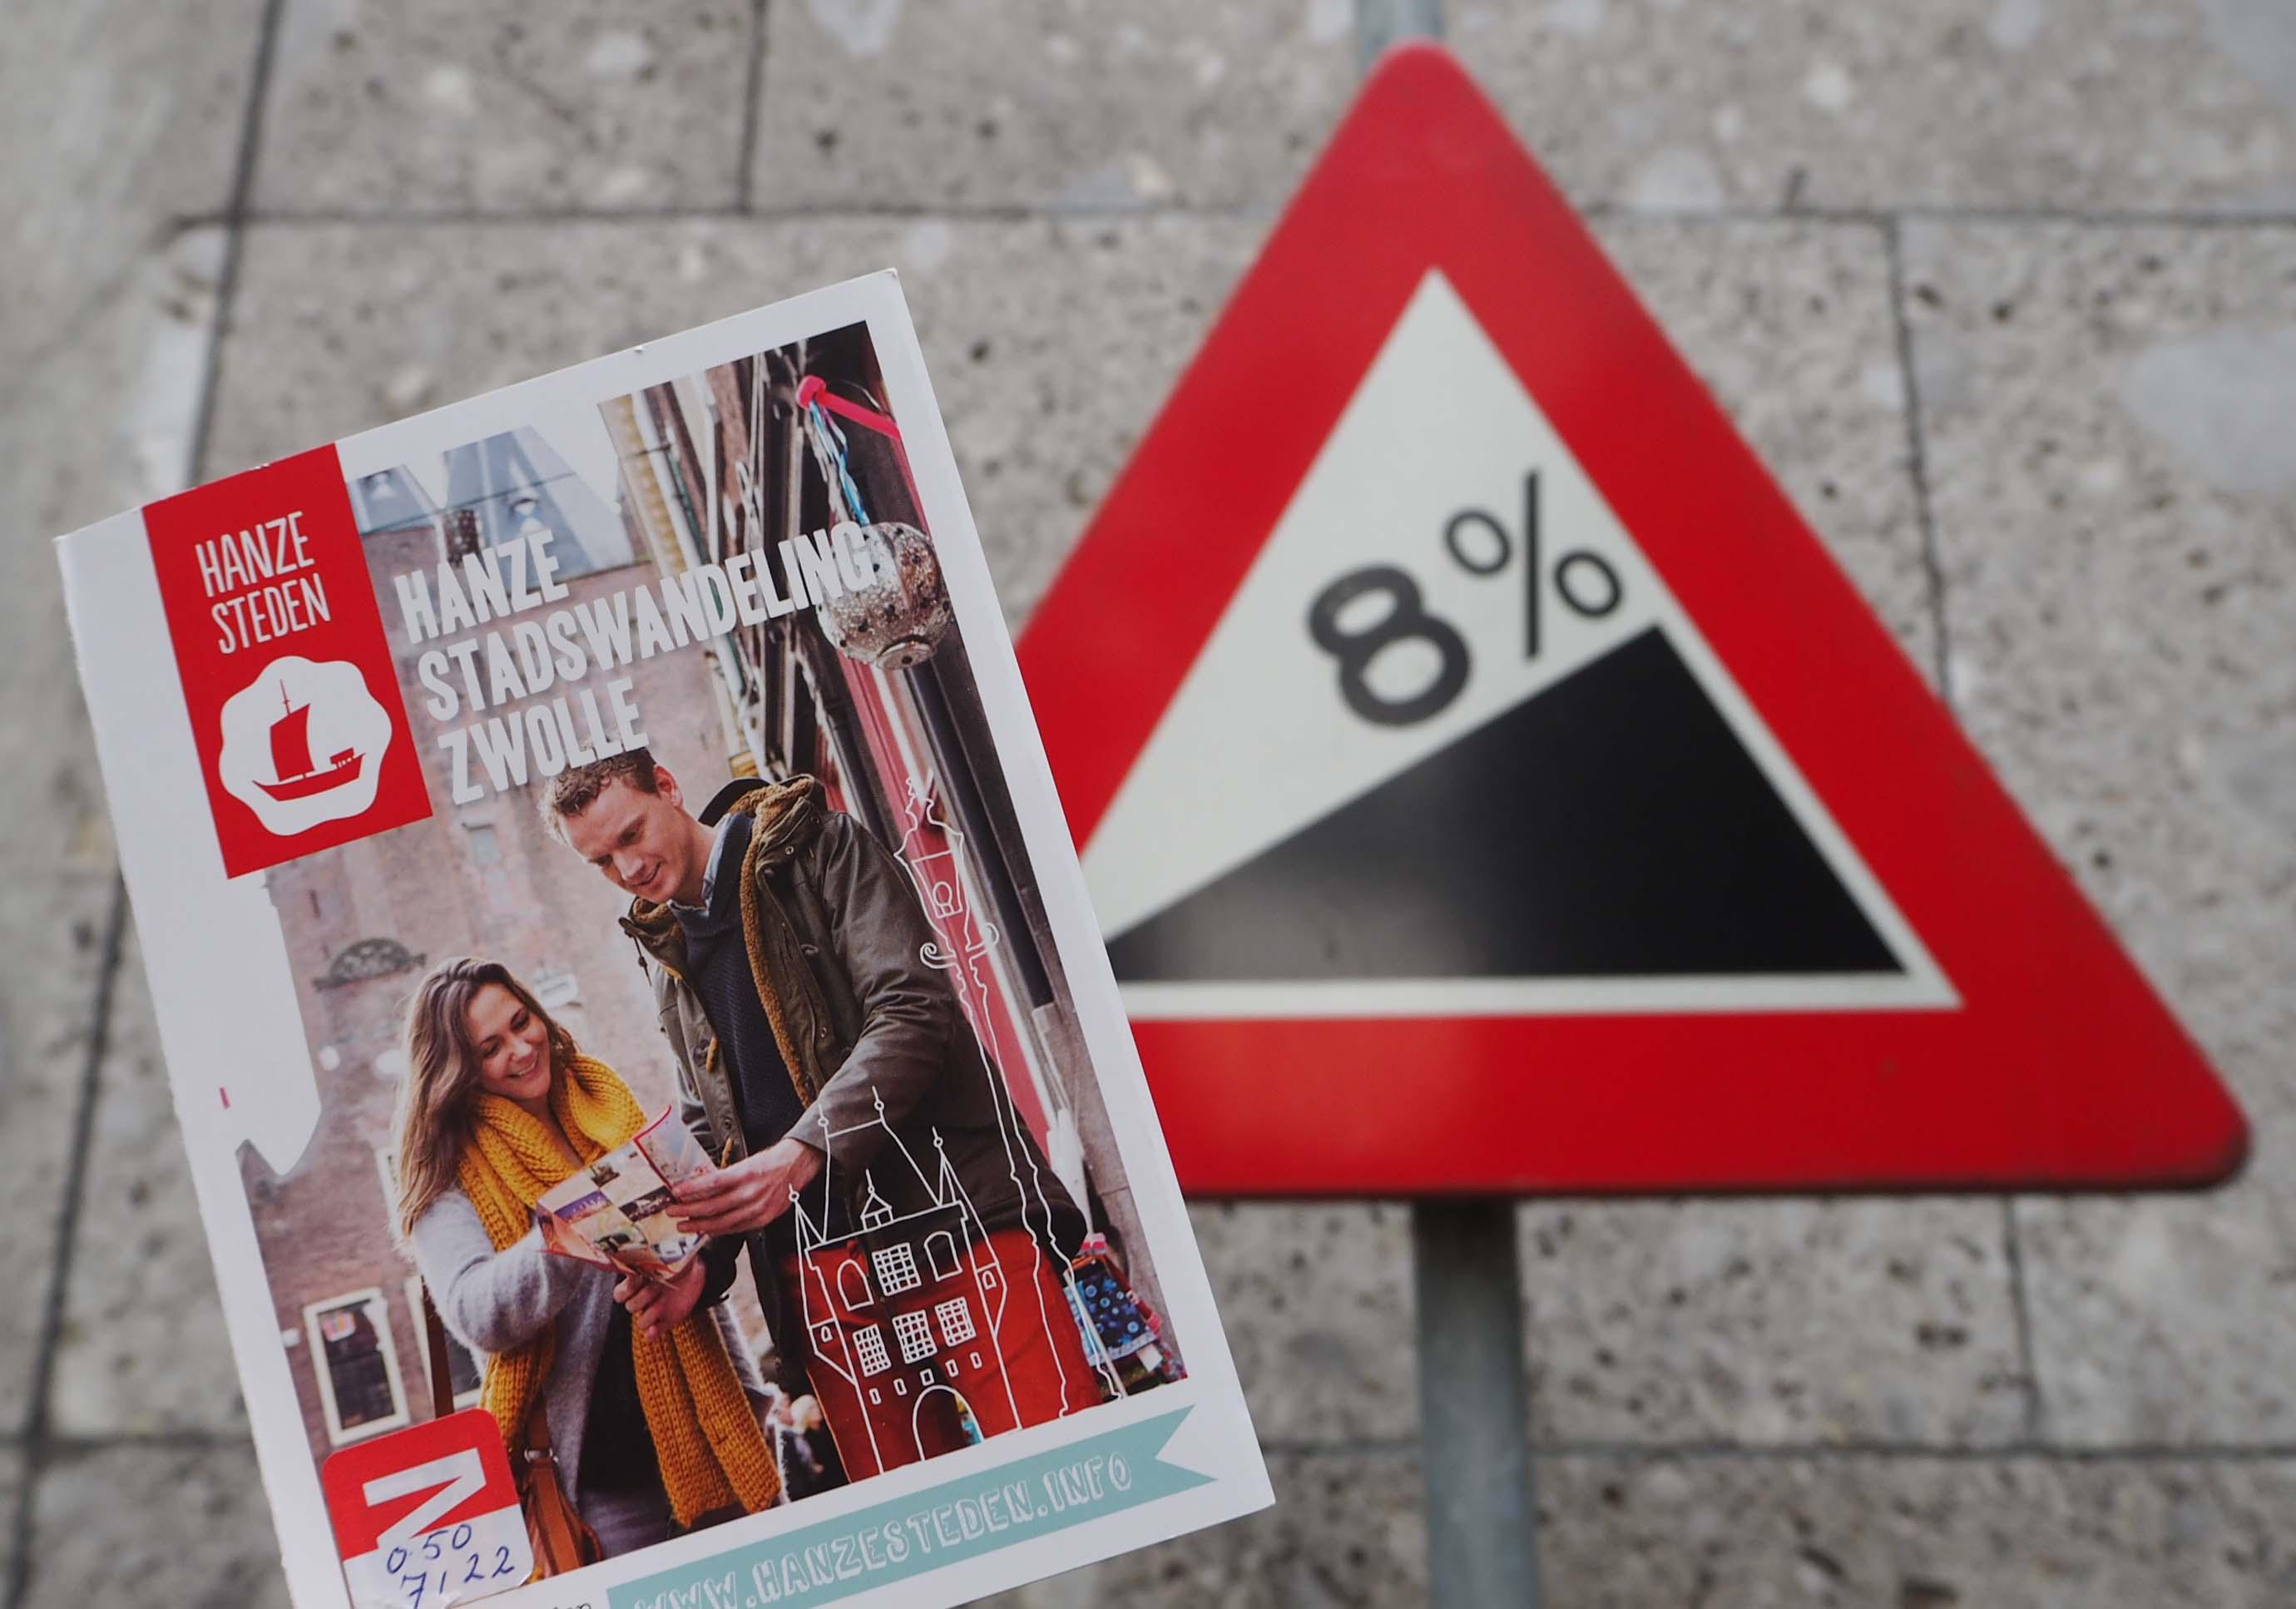 Hanzestad Zwolle ideaal te verkennen met de Hanze stadswandeling